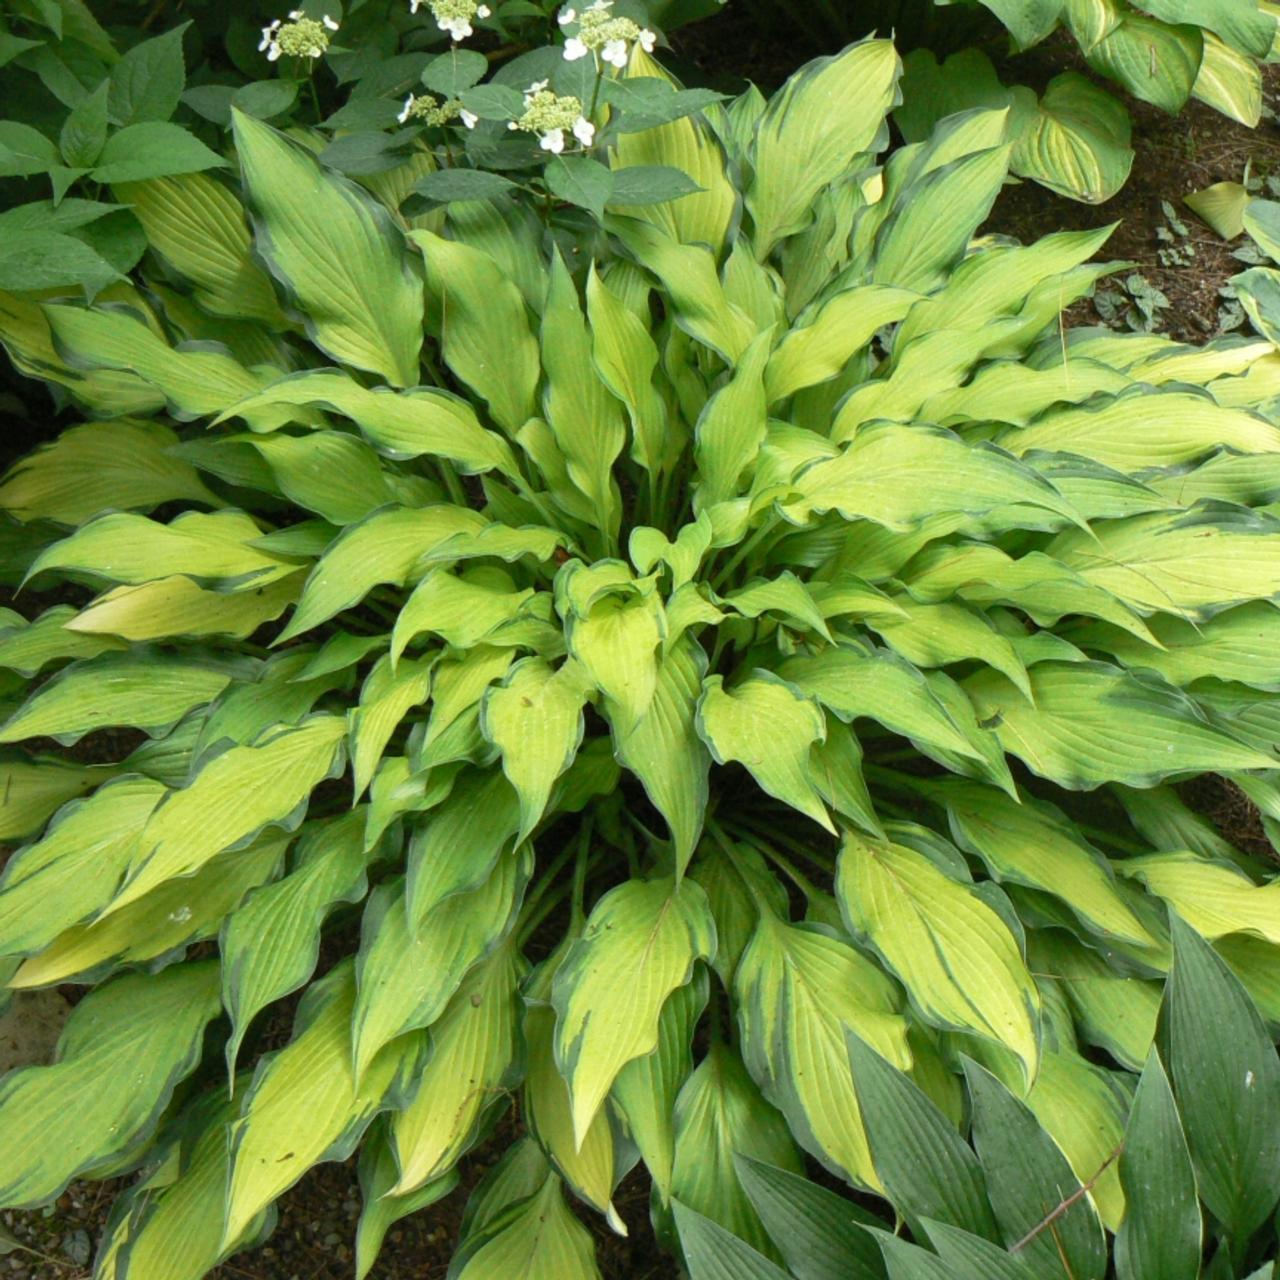 Hosta 'Pineapple Upsidedown Cake' plant